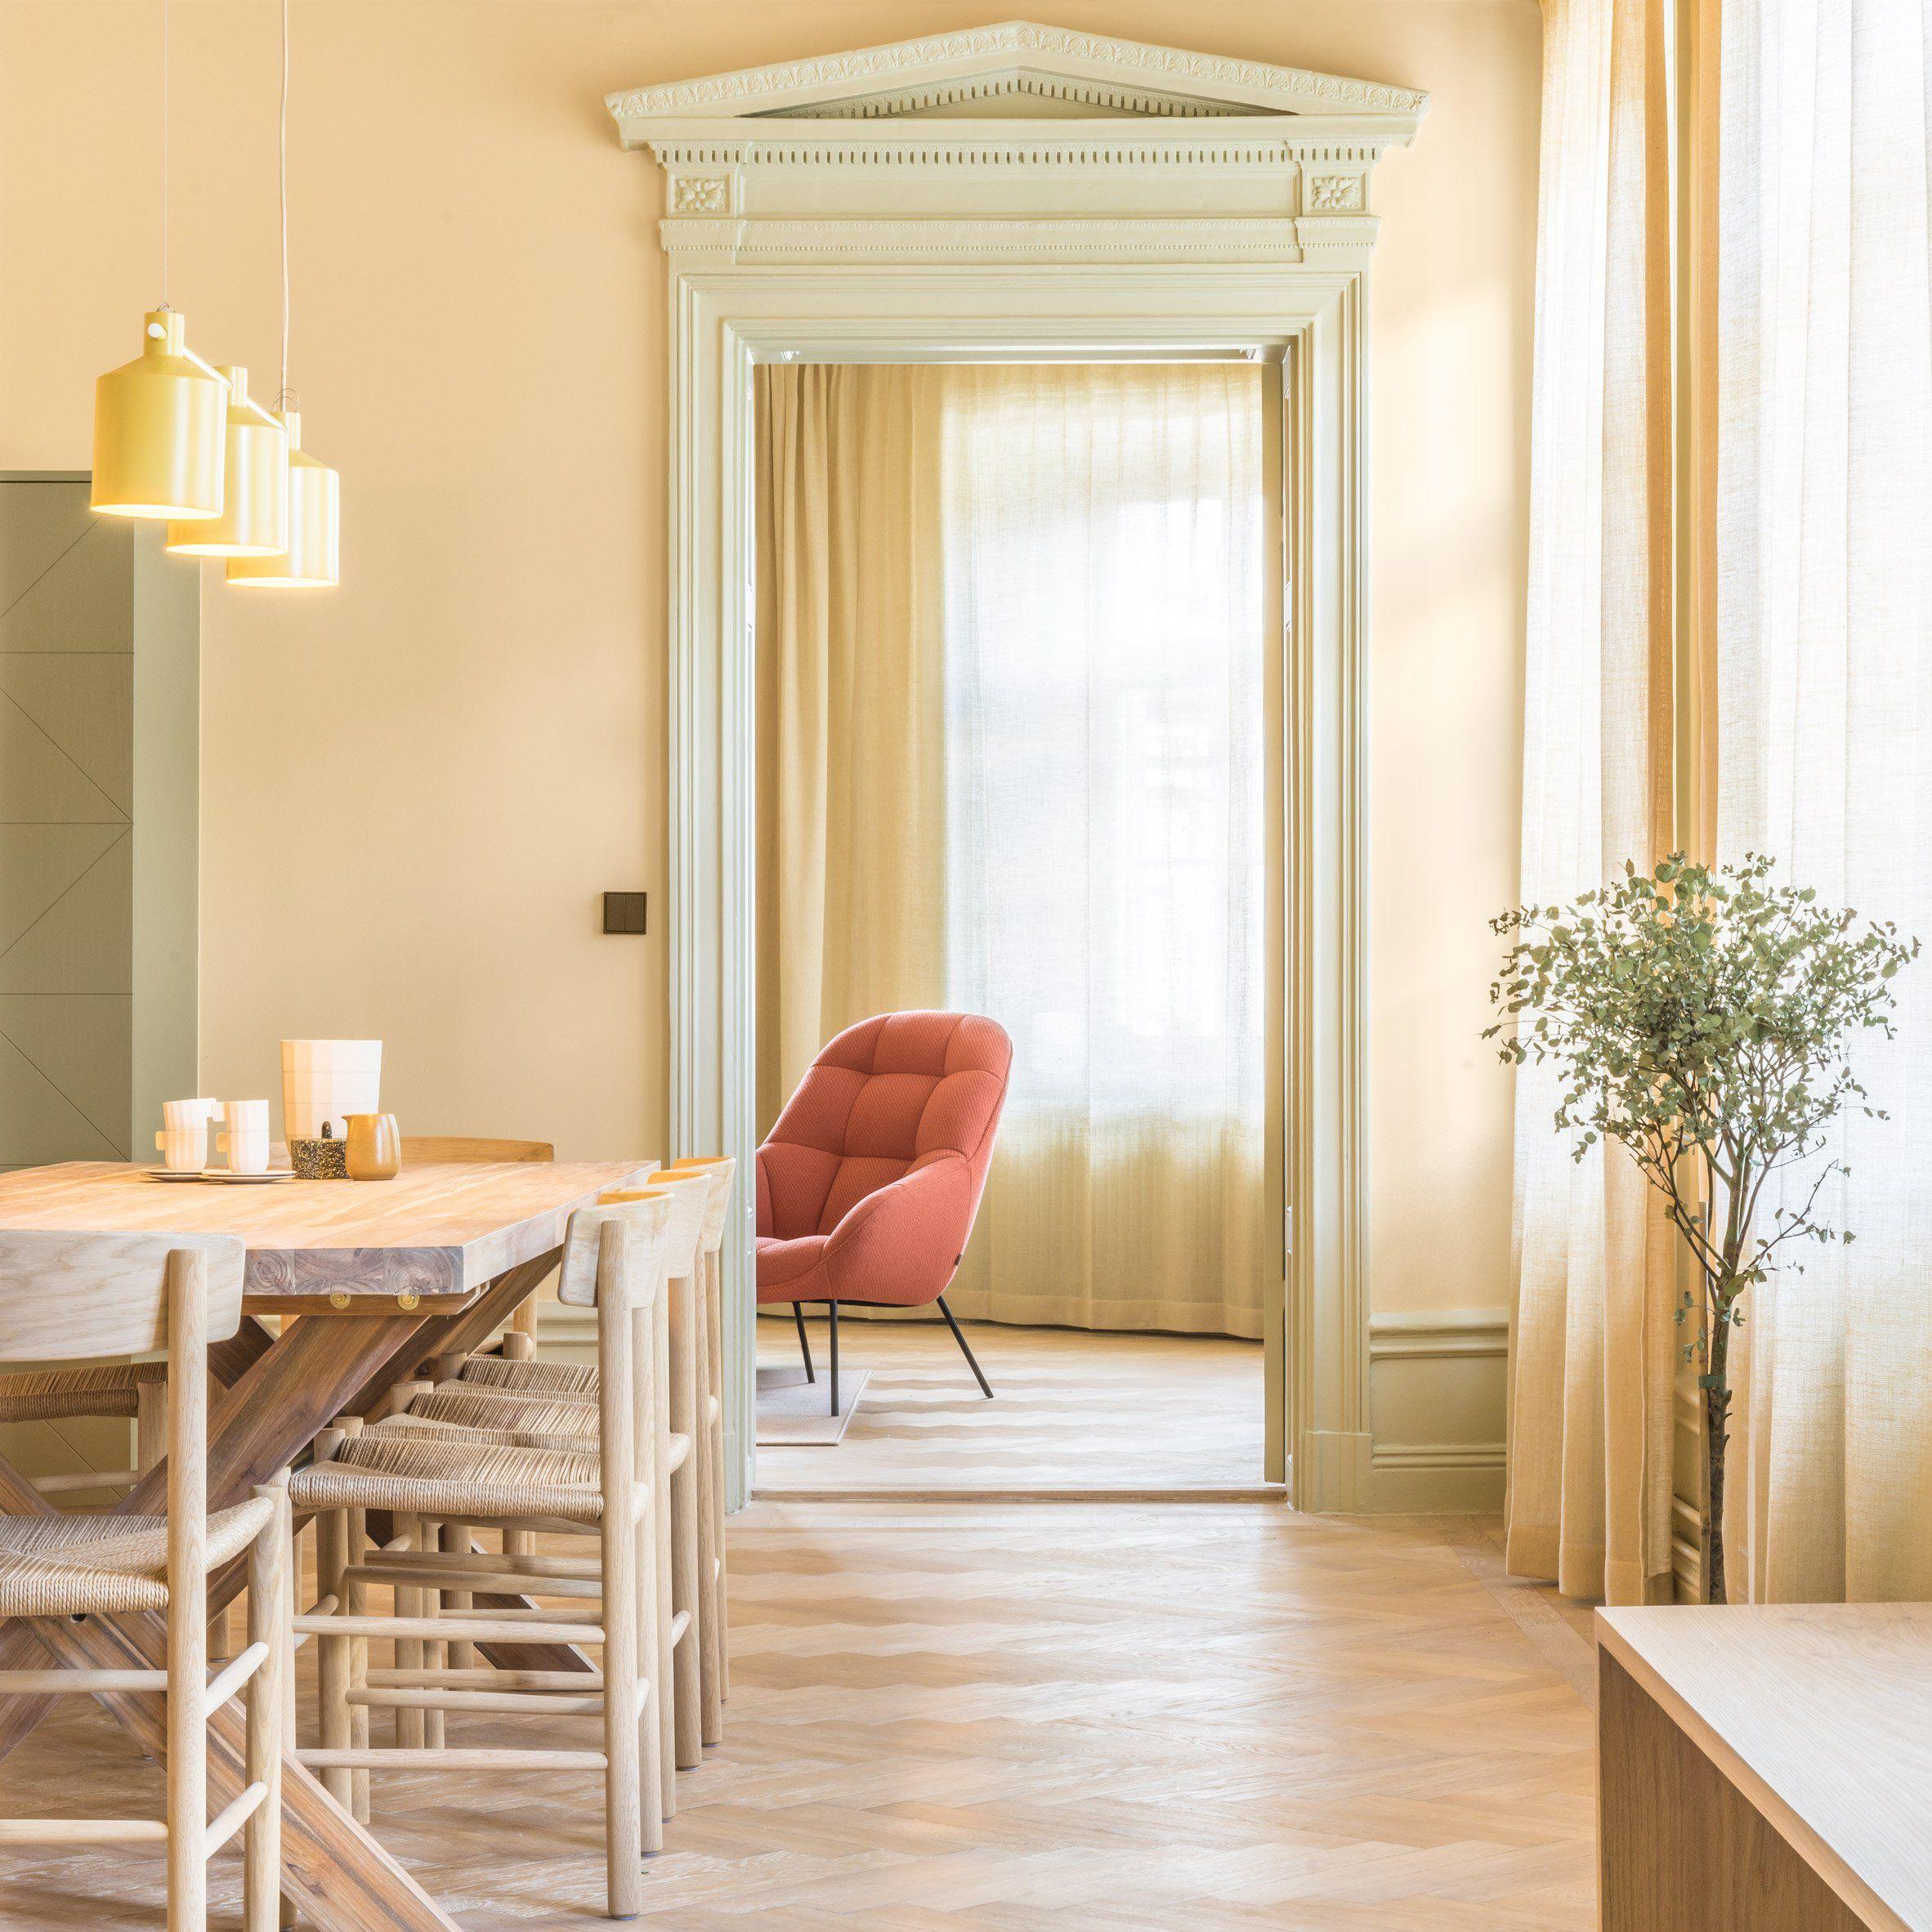 Dezeen S Top 10 Home Interiors Of 2017 Pastel Interior Note Design Studio Fredericia Furniture